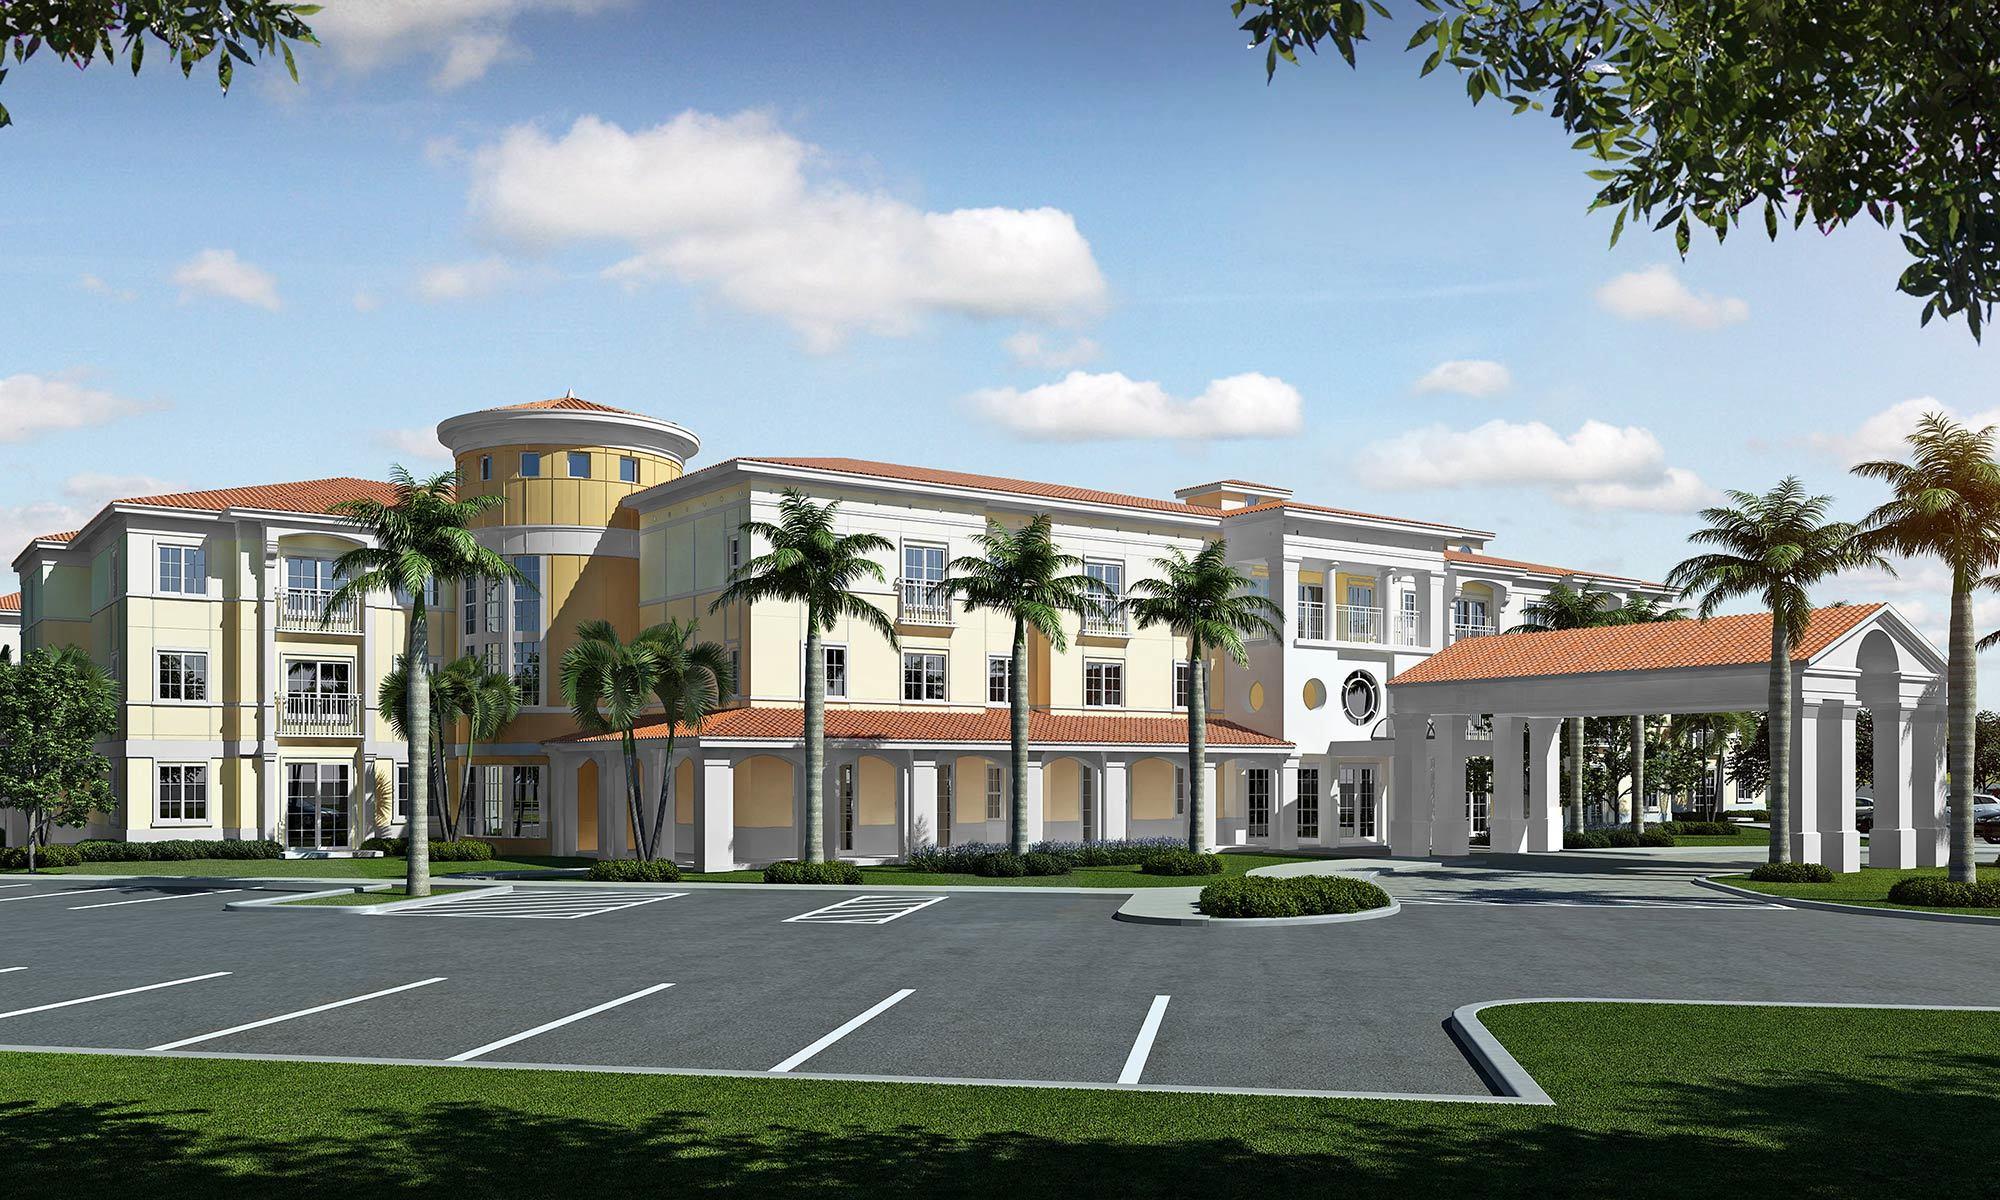 Senior living in Boca Raton, FL